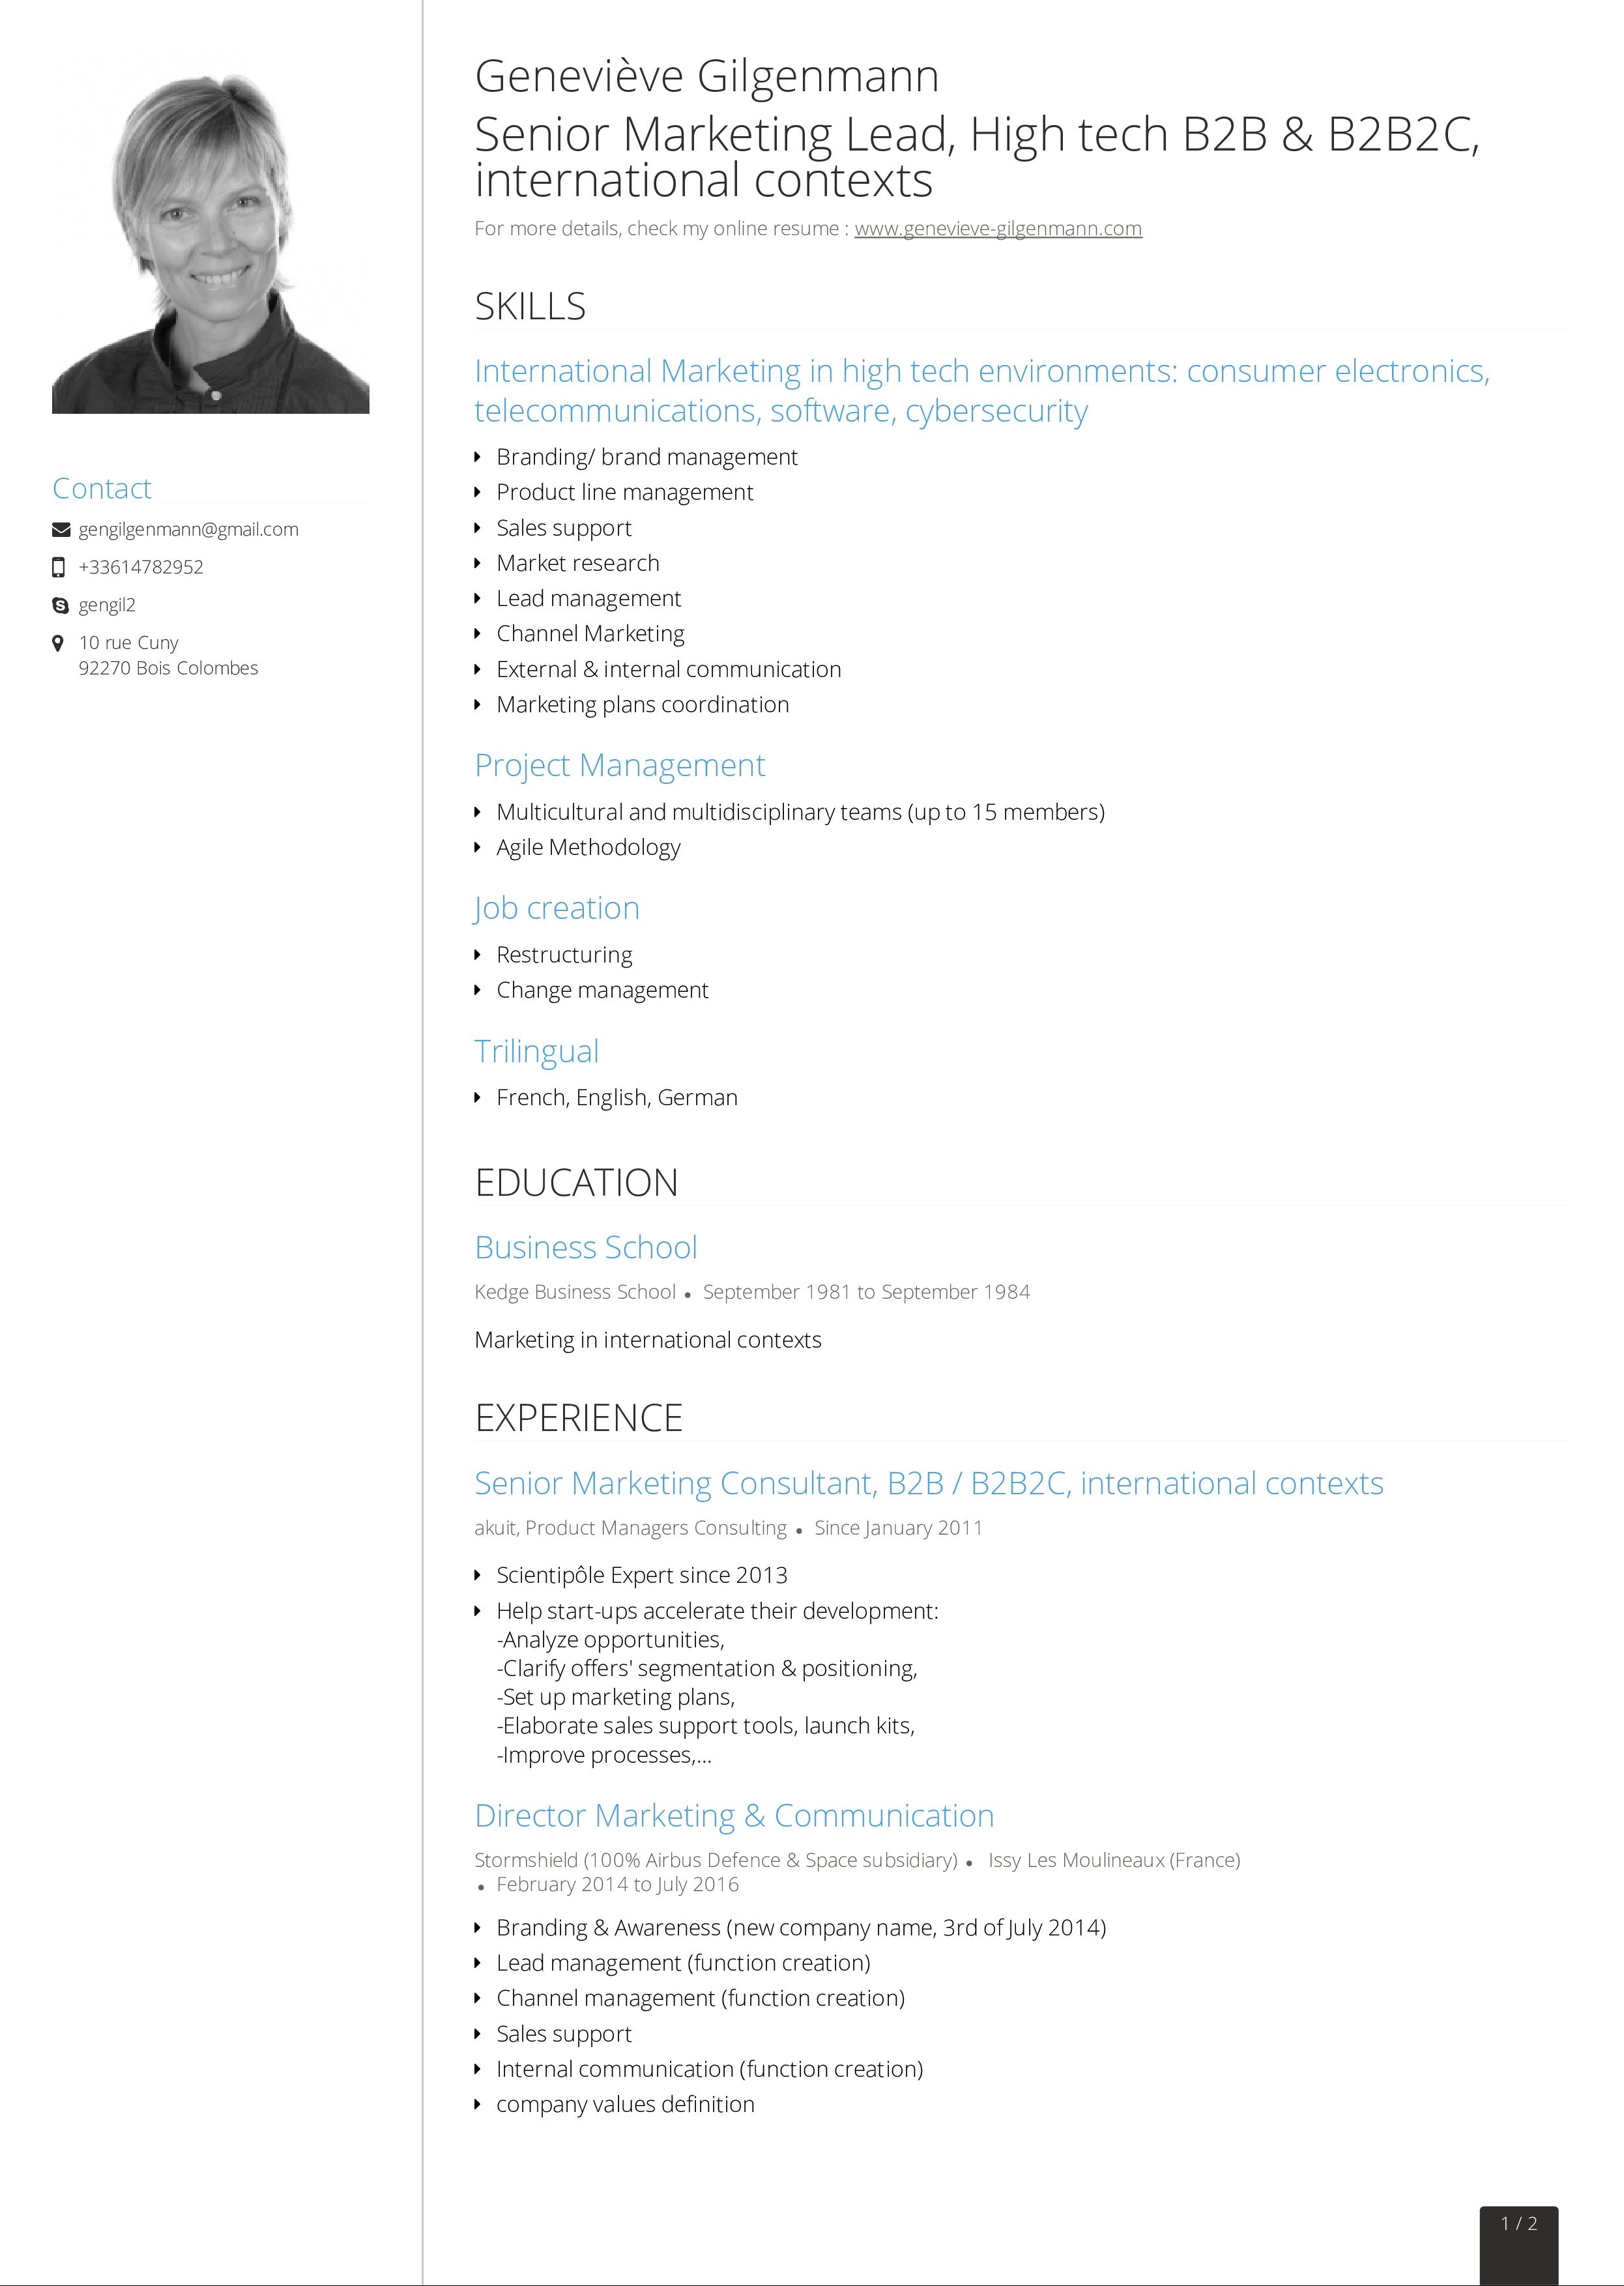 Free Senior Marketing Consultant Resume | Templates at ...